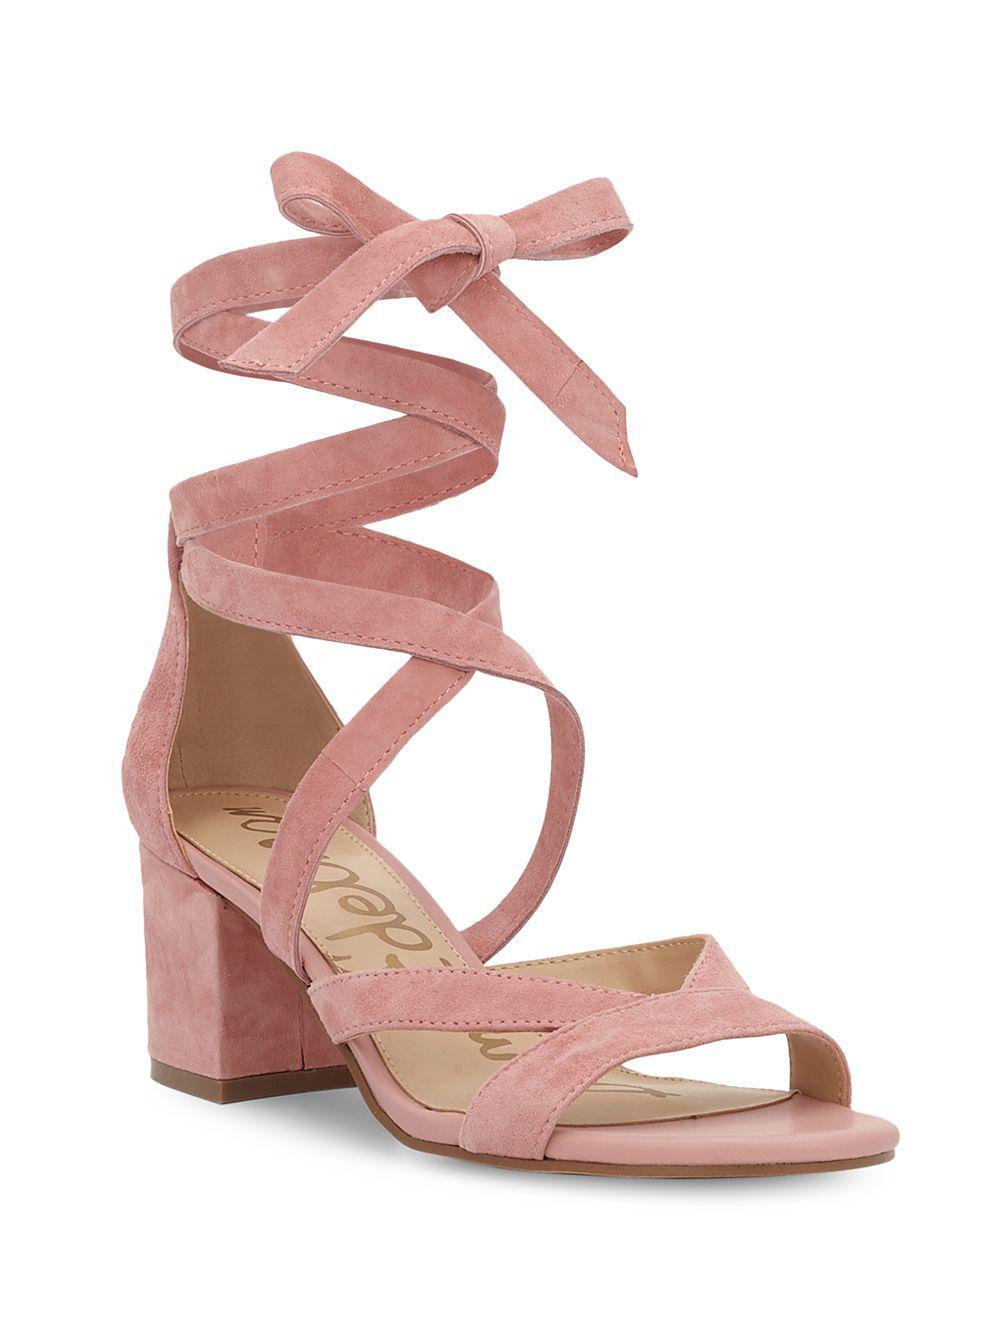 0f2b1f645e43 Lyst - Sam Edelman Sheri Suede Block Heel Sandals in Pink